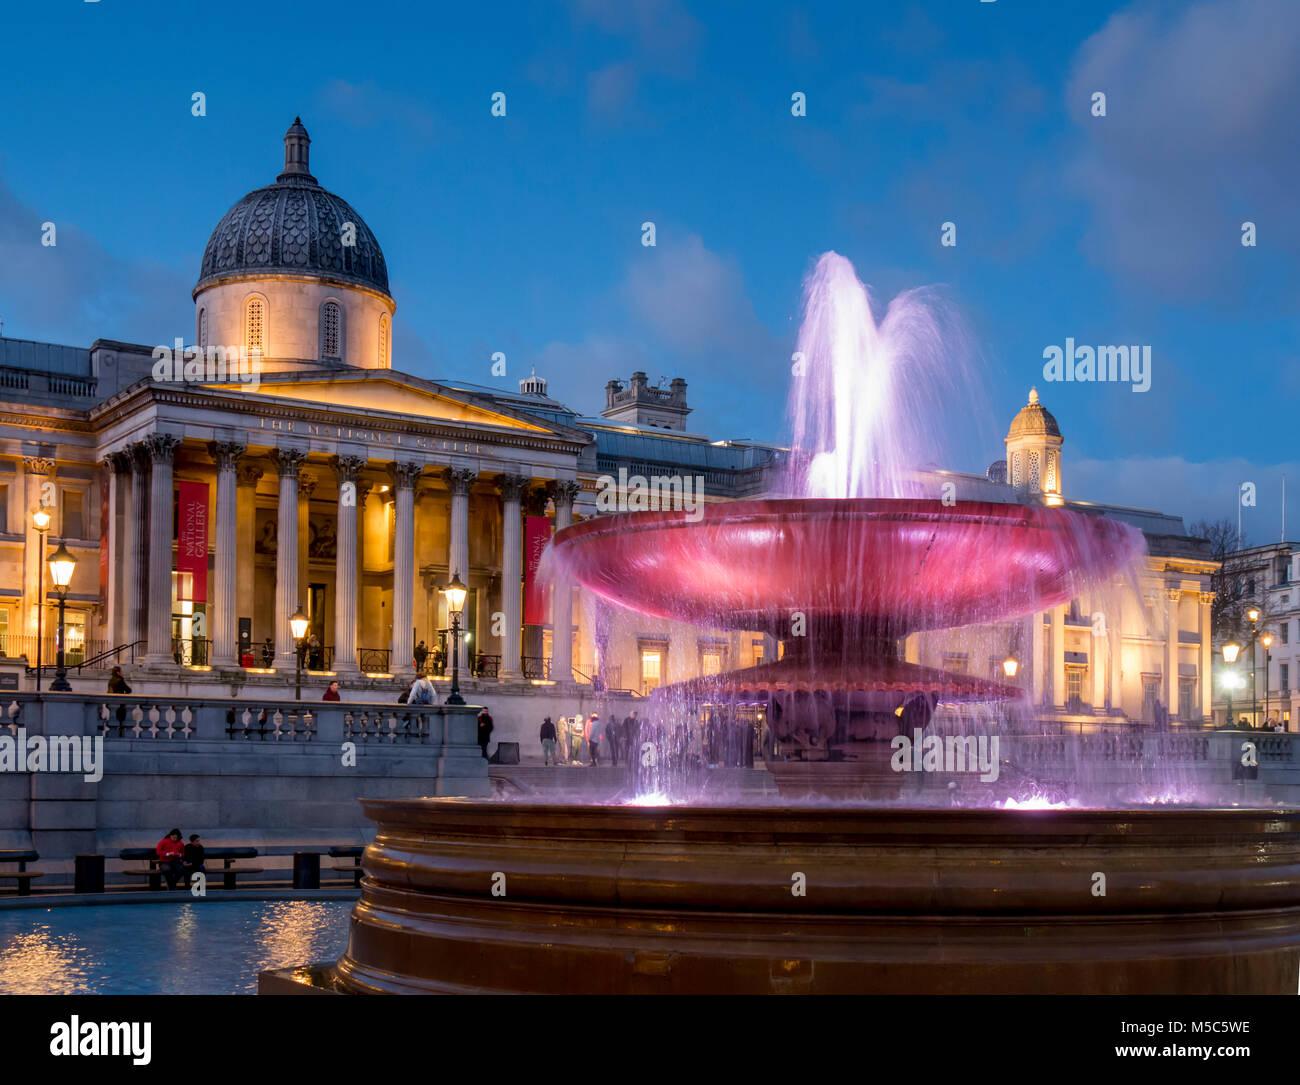 UK, england, London, Trafalgar Sq National Gallery dusk - Stock Image